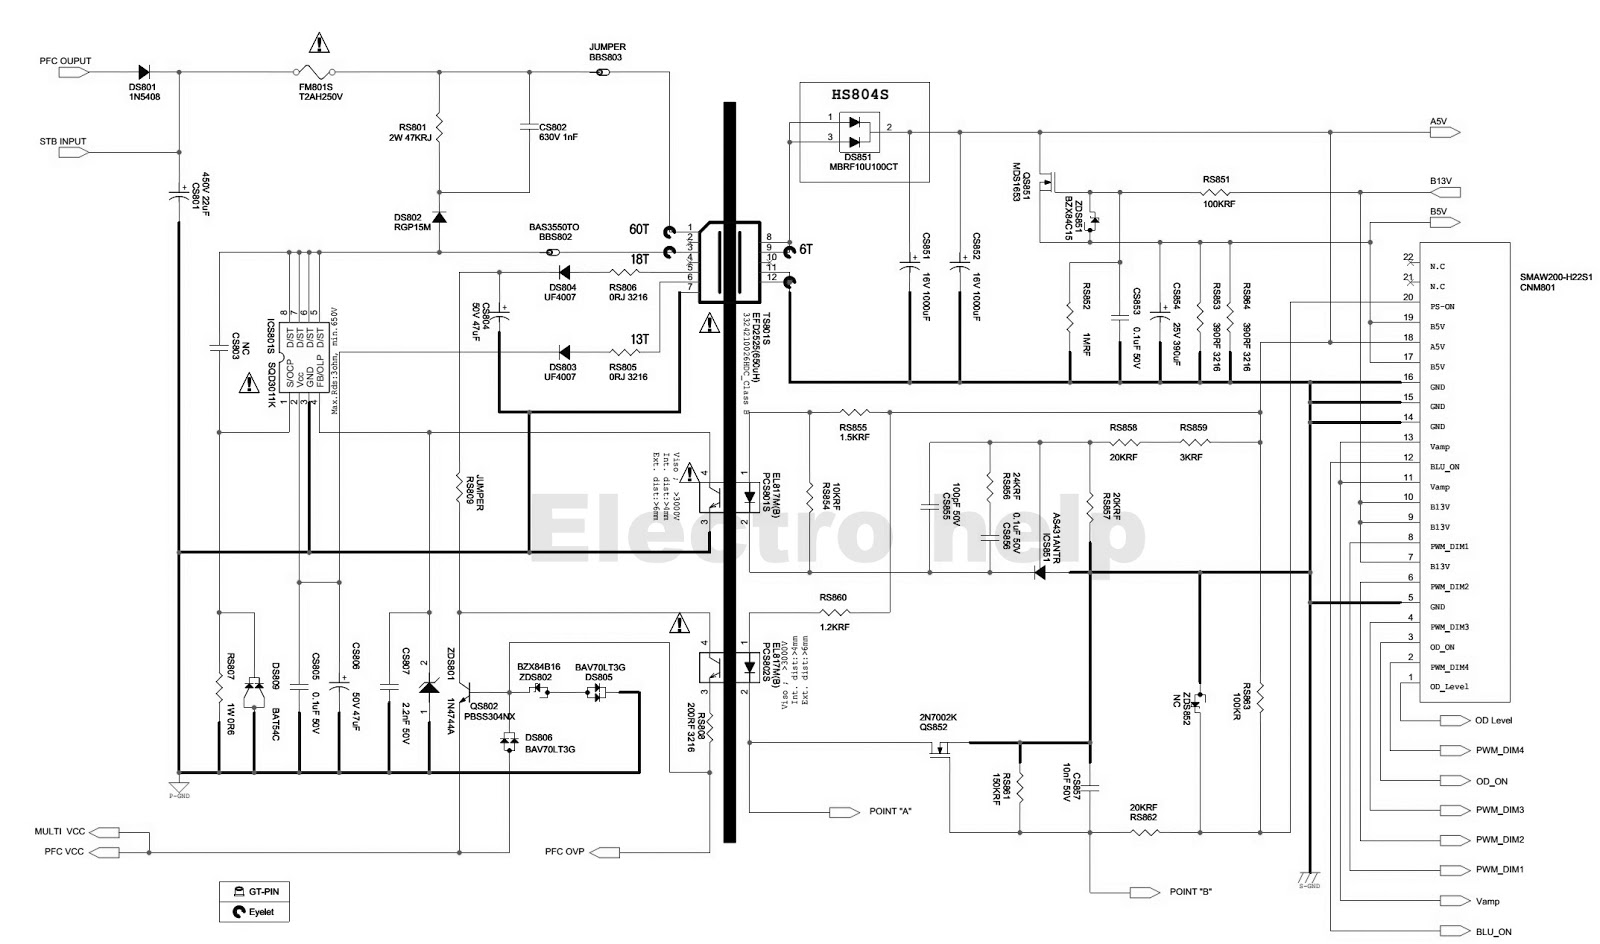 wiring harness for gm 13020122 wiring diagrams bib wiring harness for gm 13020122 wiring diagram wiring harness for gm 13020122